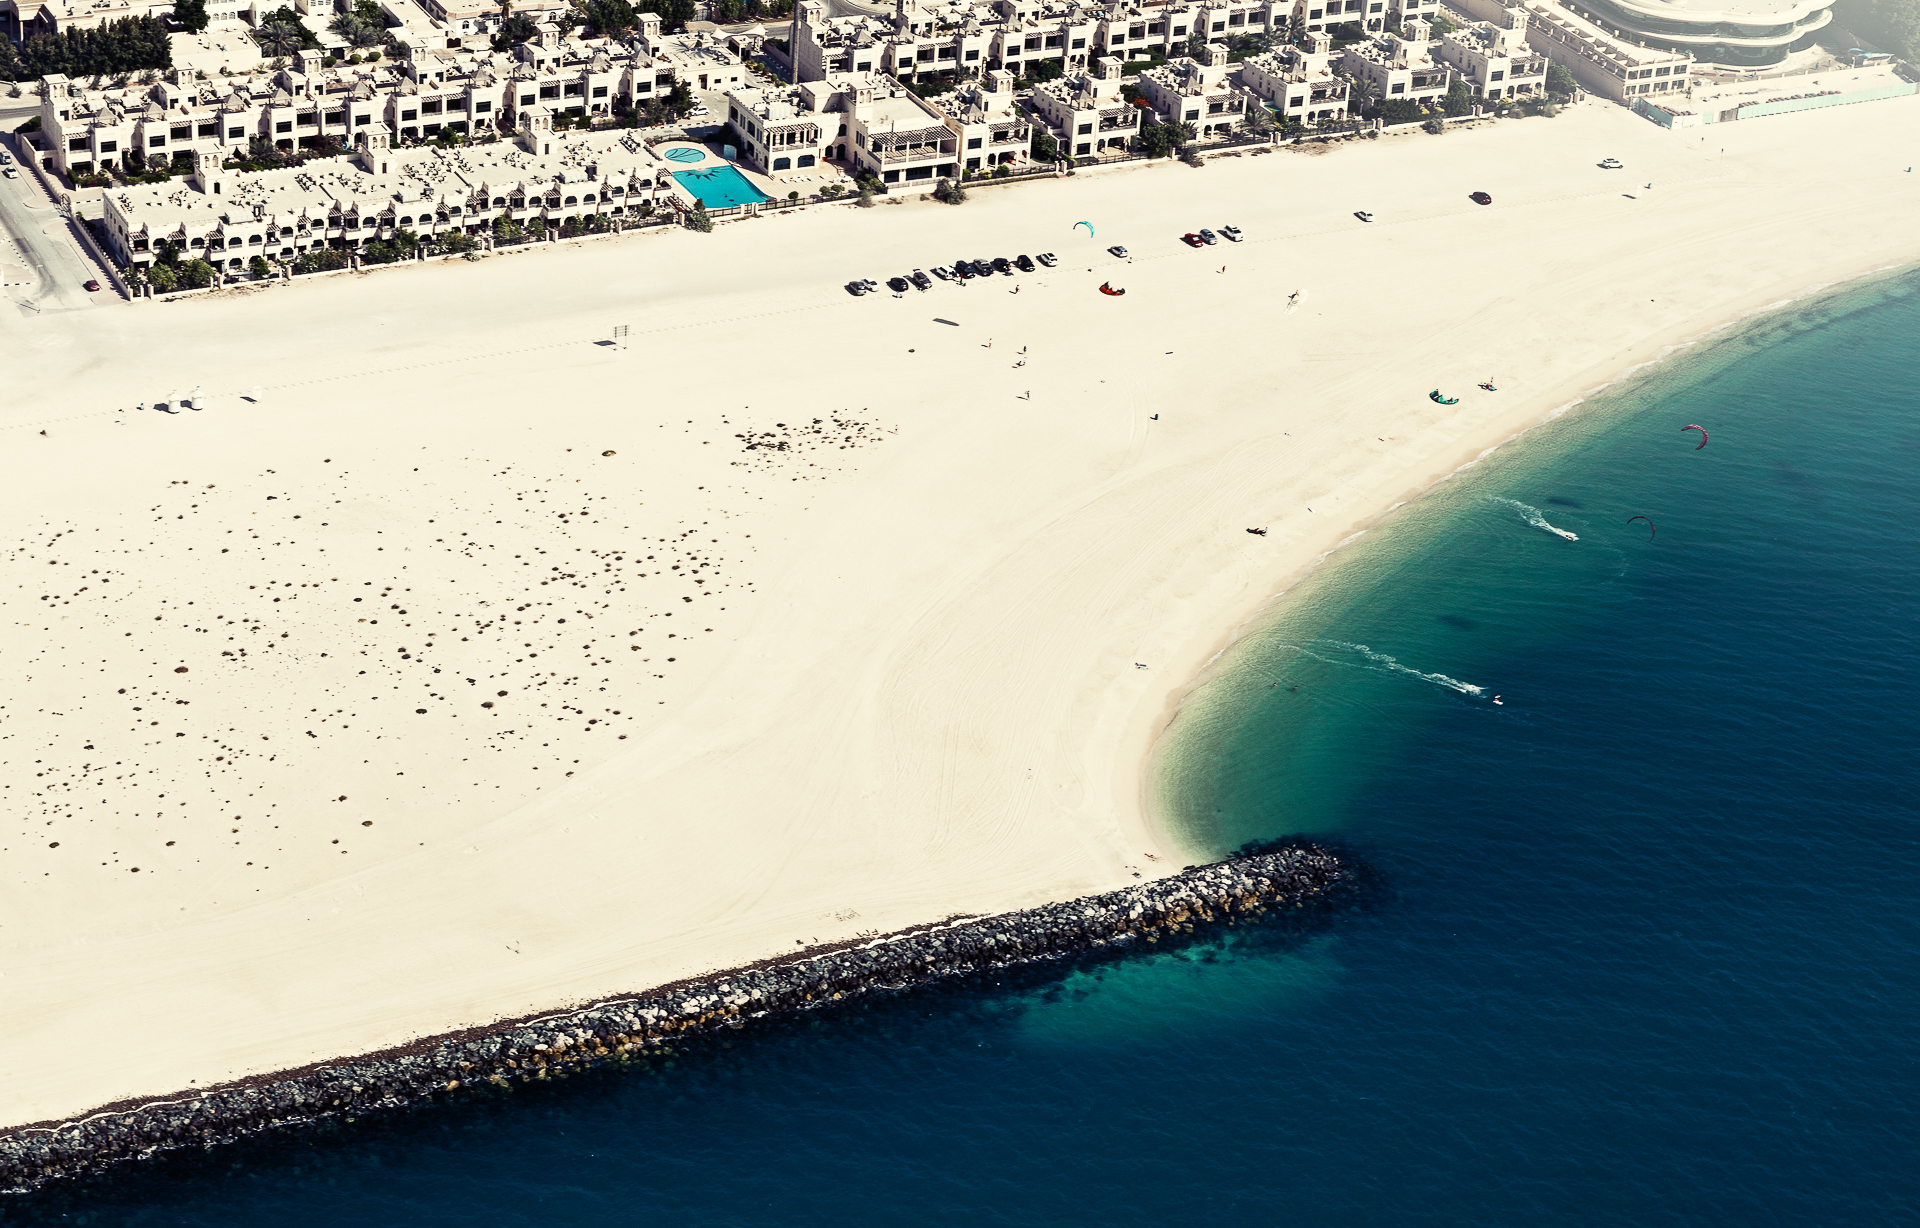 Gökhan_Orhan_Portfolio_Landscape_Dubai-7